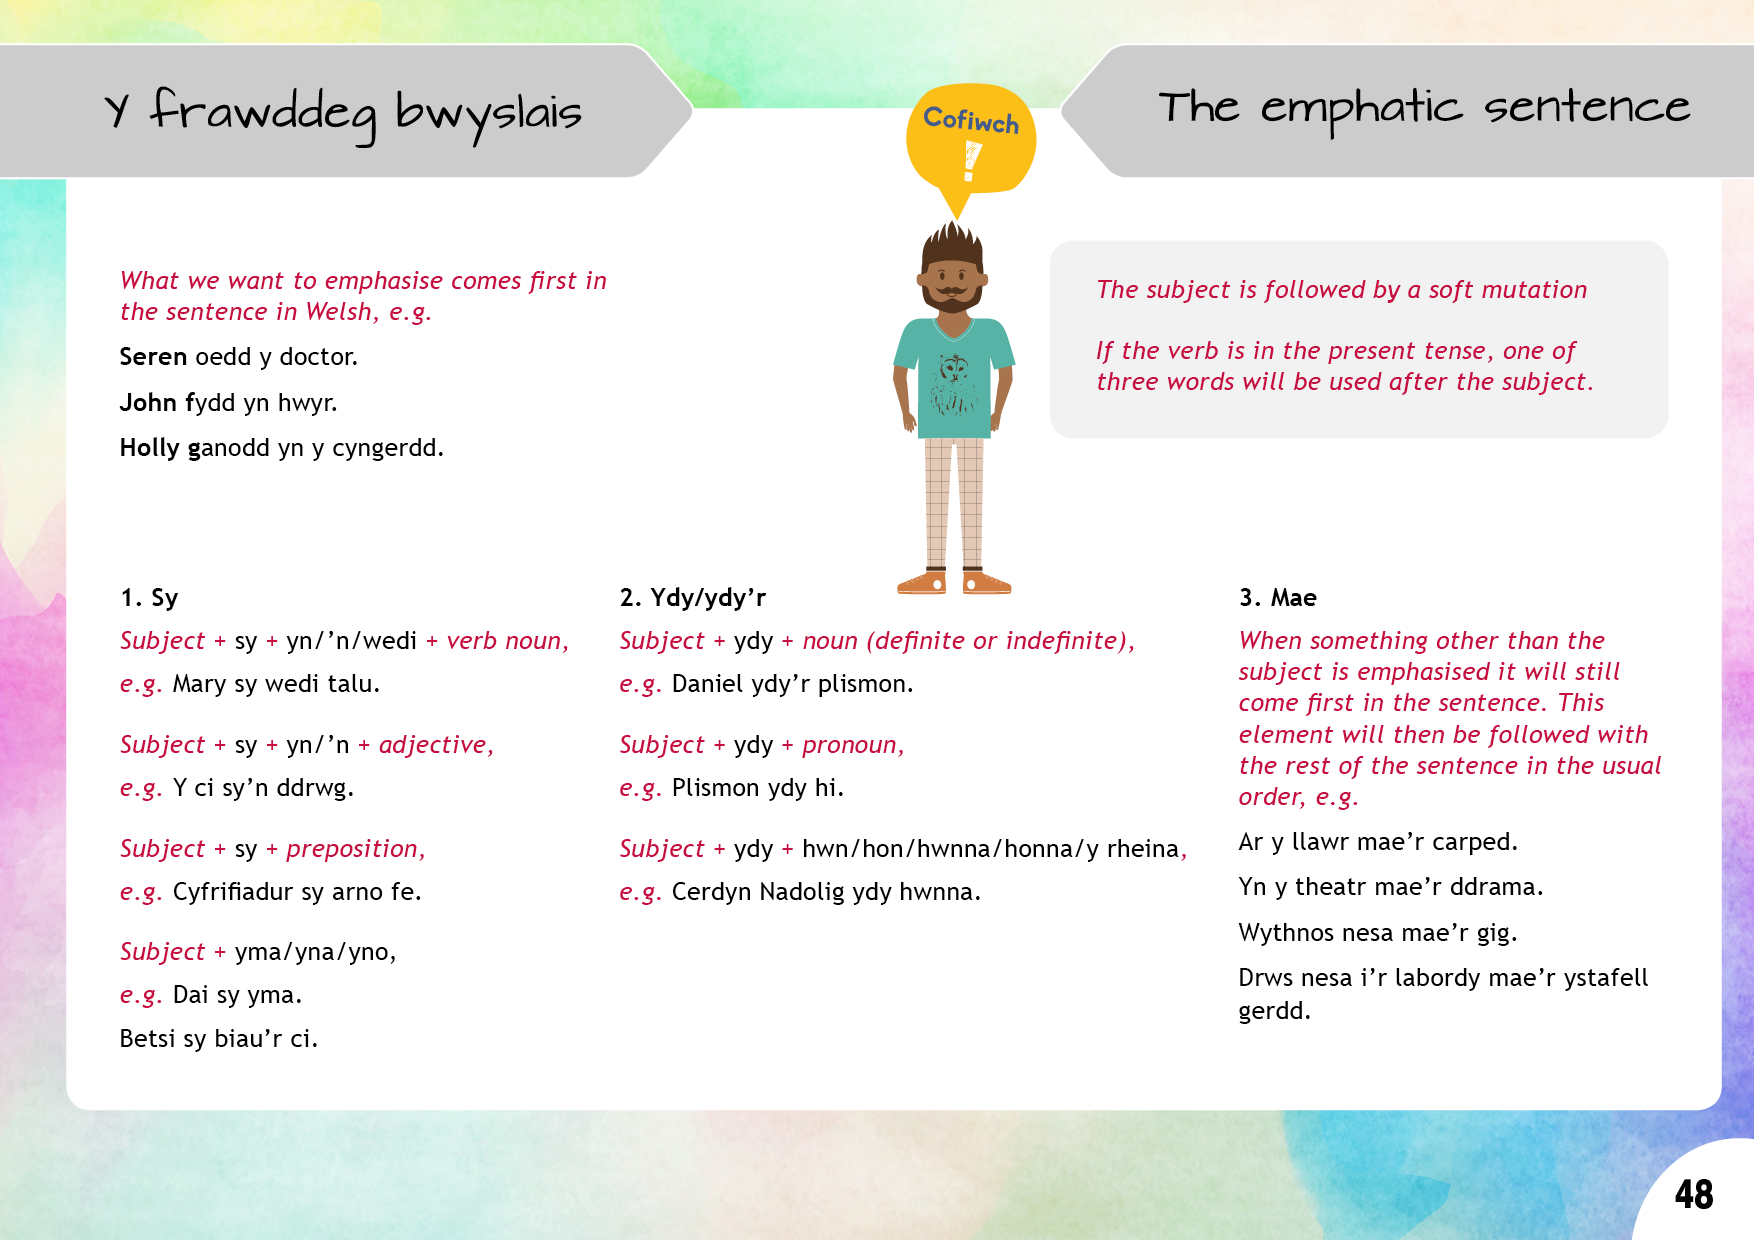 Y frawddeg bwyslais | The emphatic sentence